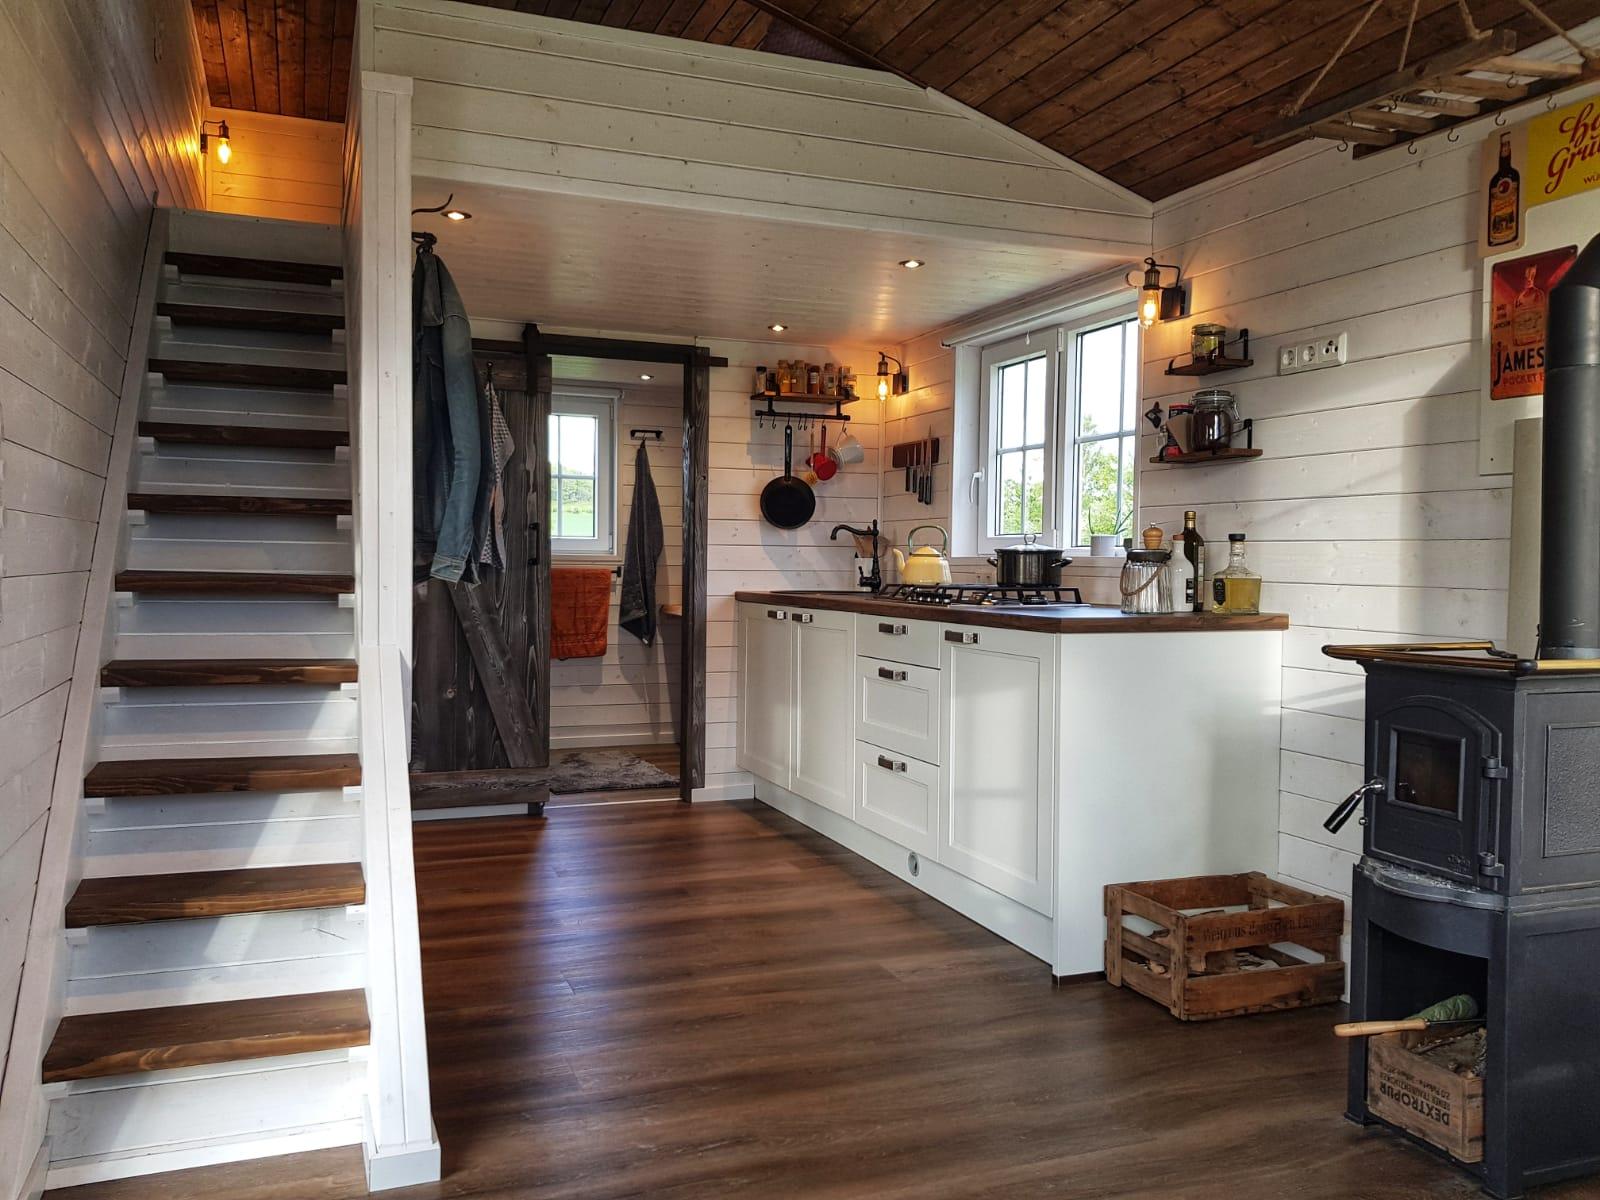 gebautes chalet-vital-camp-gmbh04